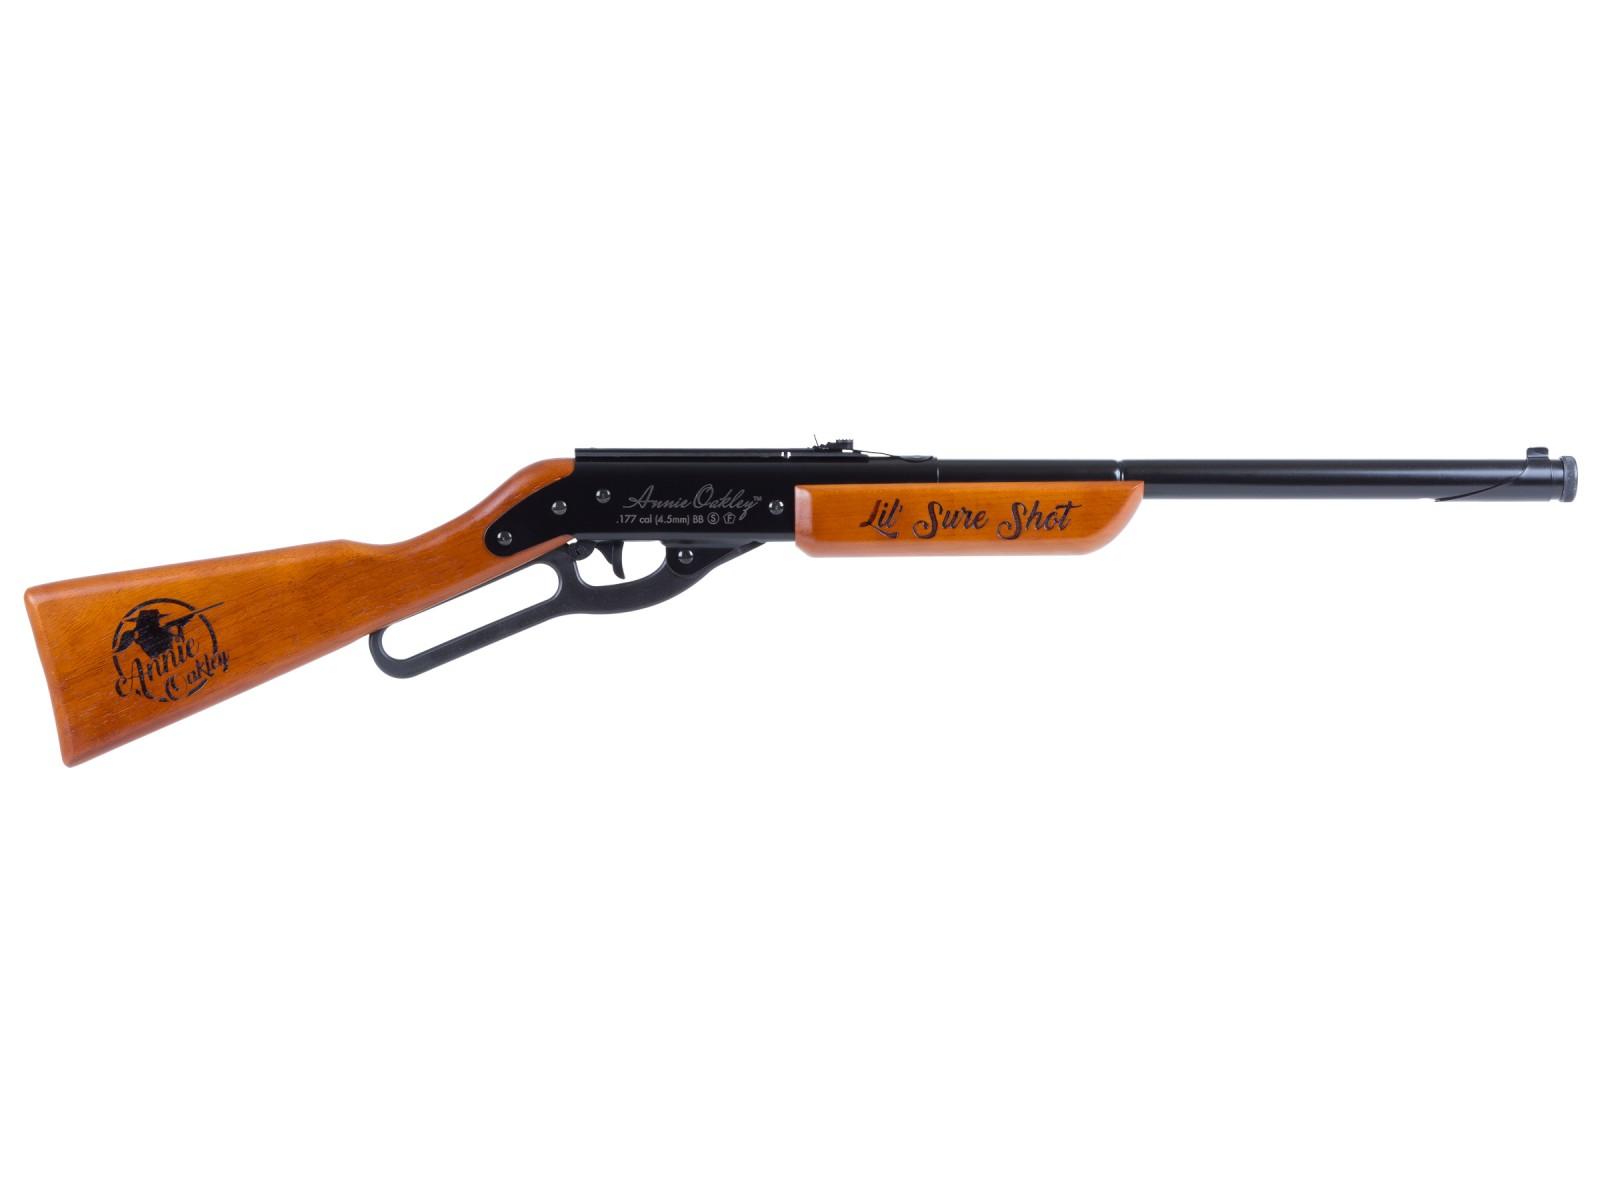 Annie Oakley Lil Sure Shot BB Rifle 0.177